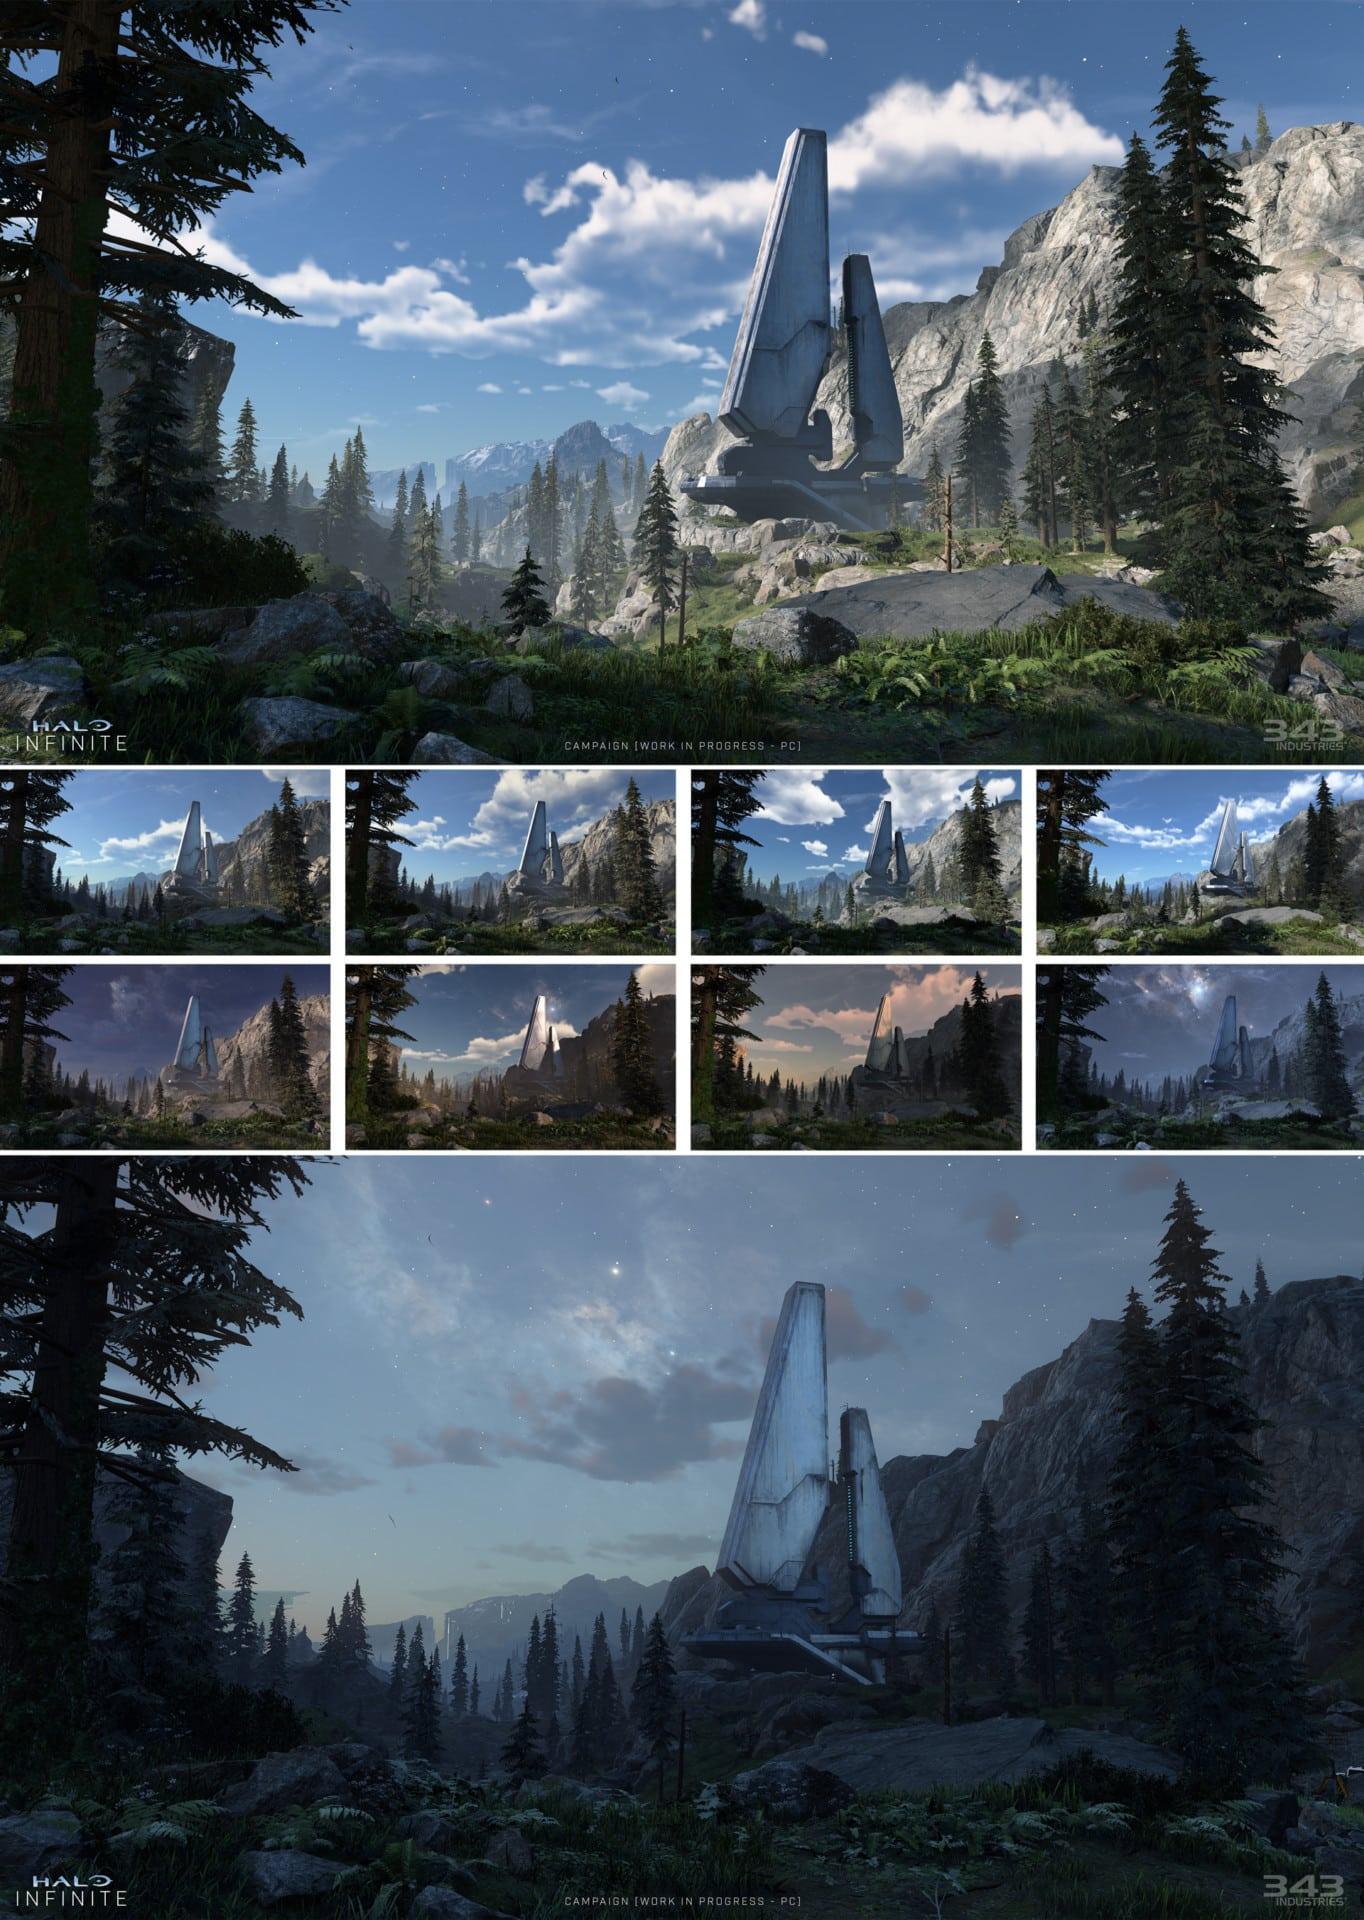 Halo Infinite sandbox world narrative visual improvements 343 industries